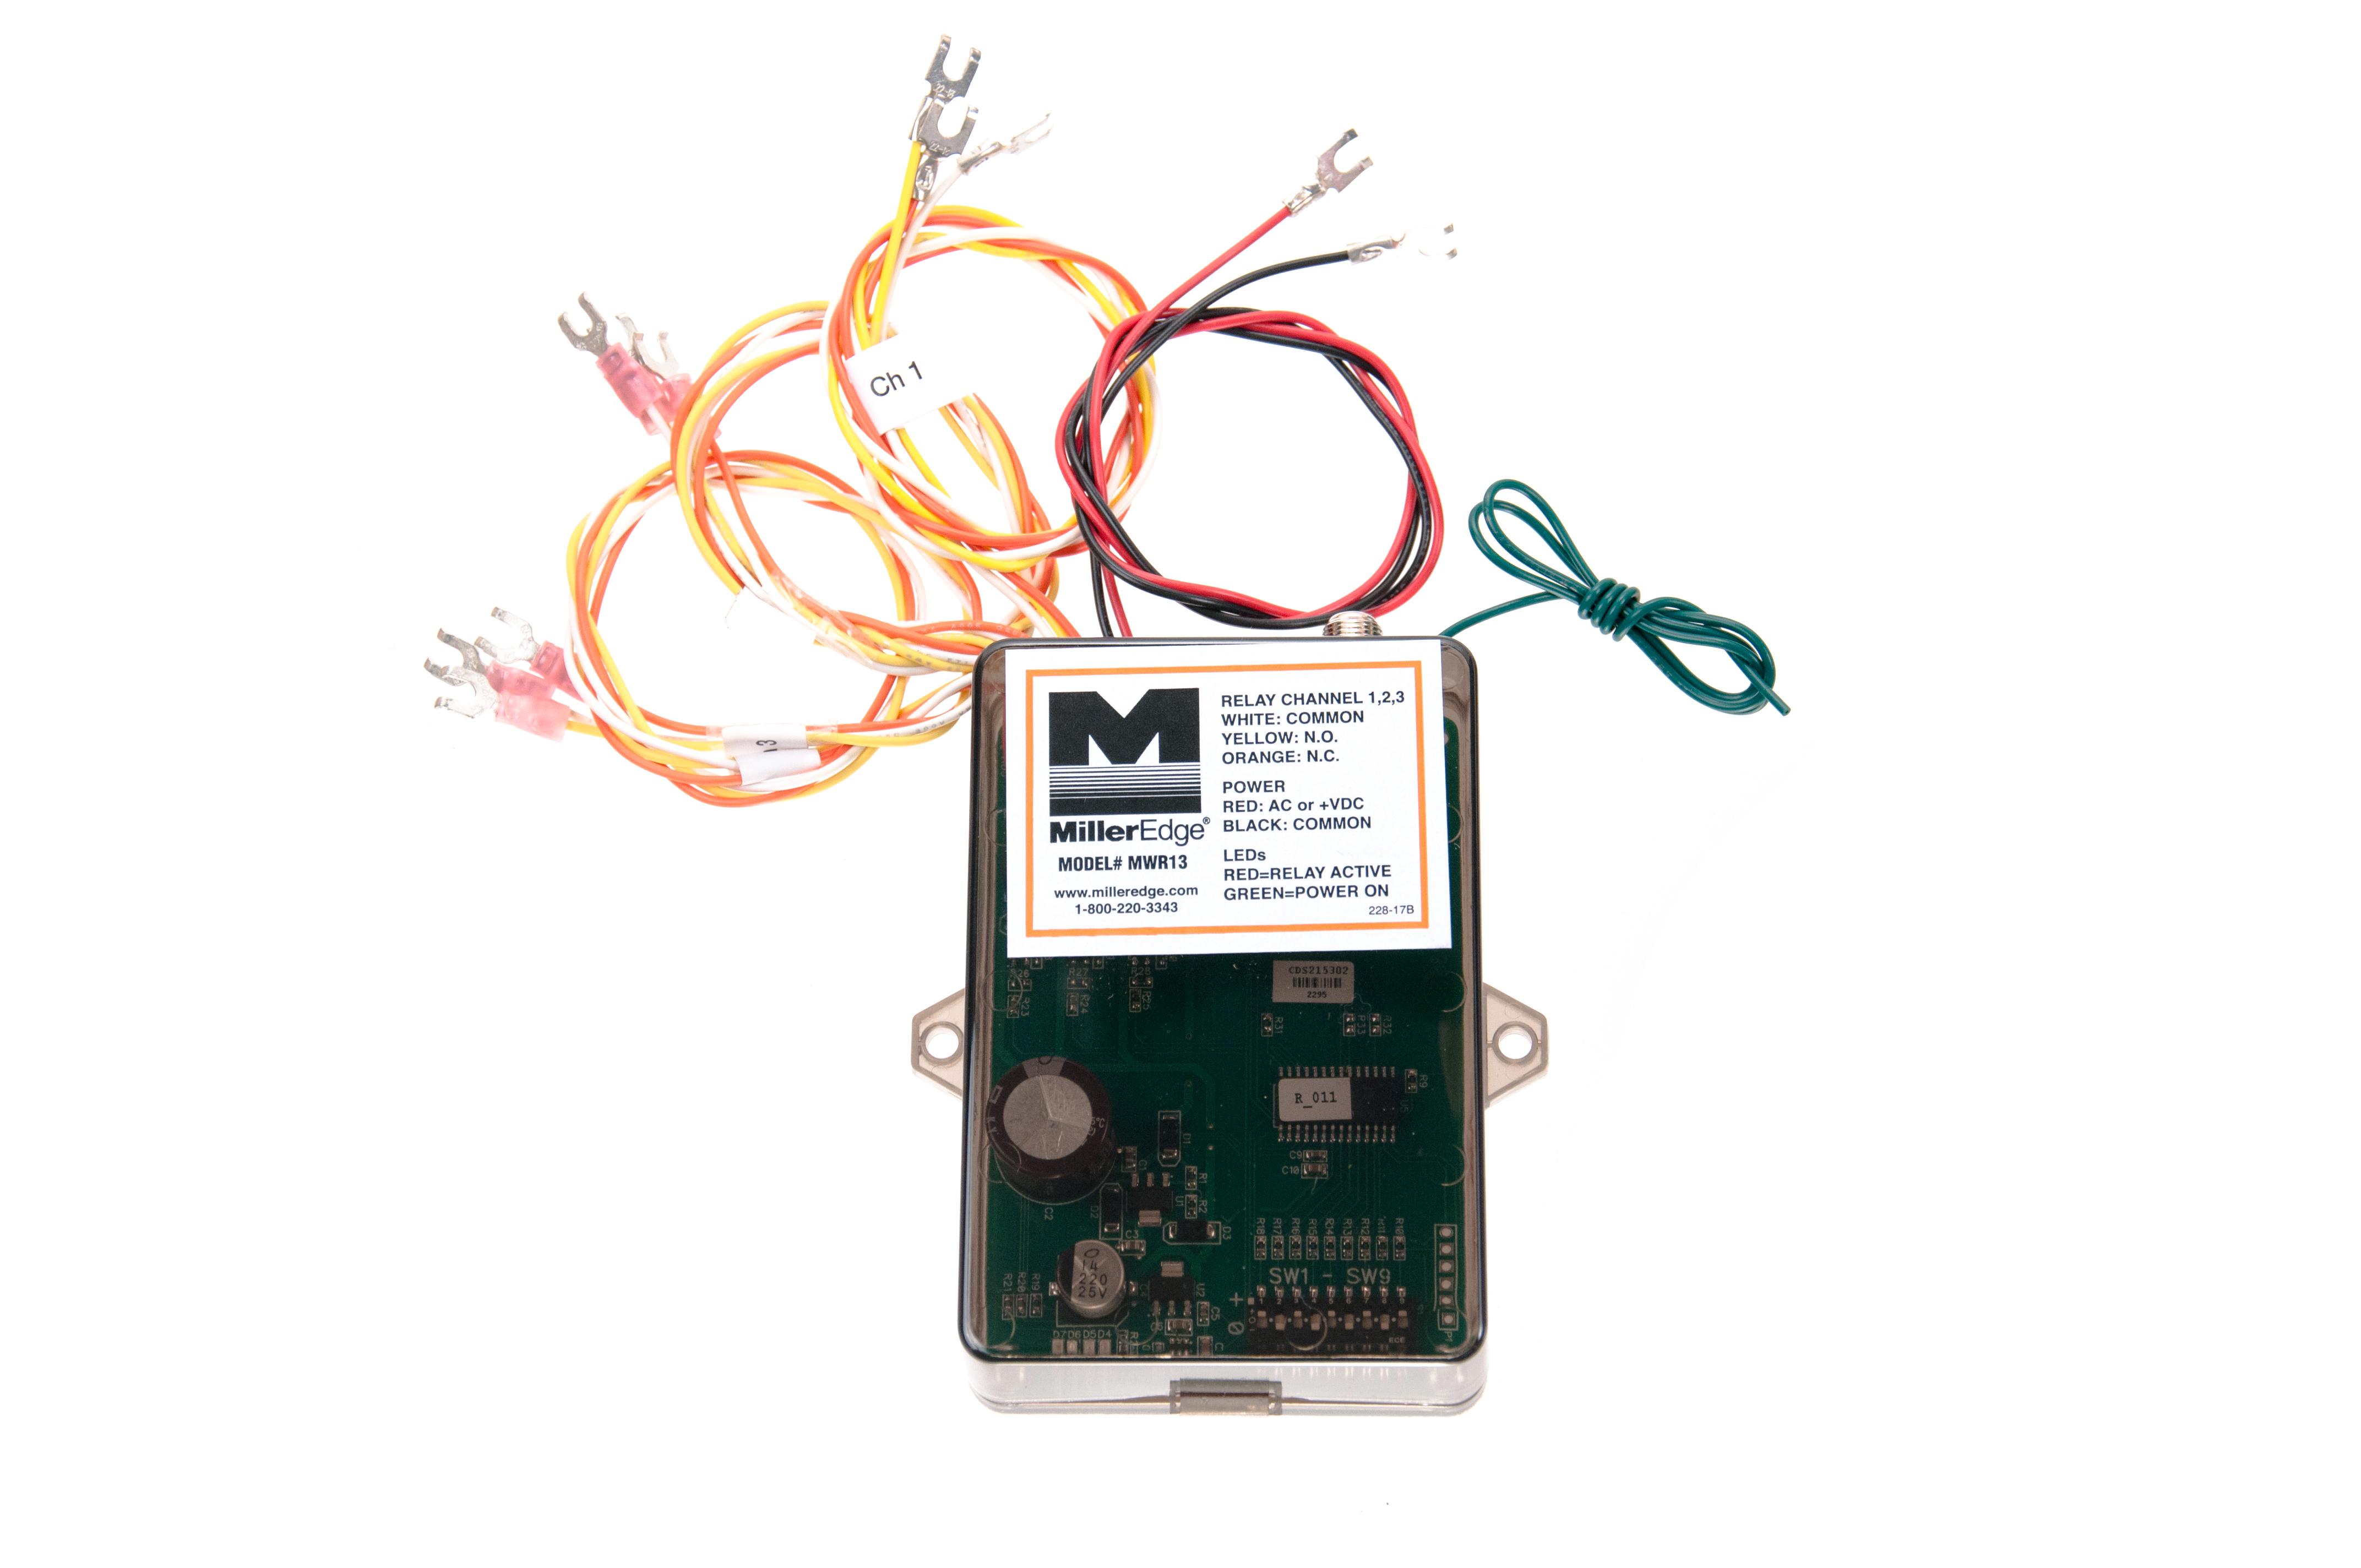 MWR13